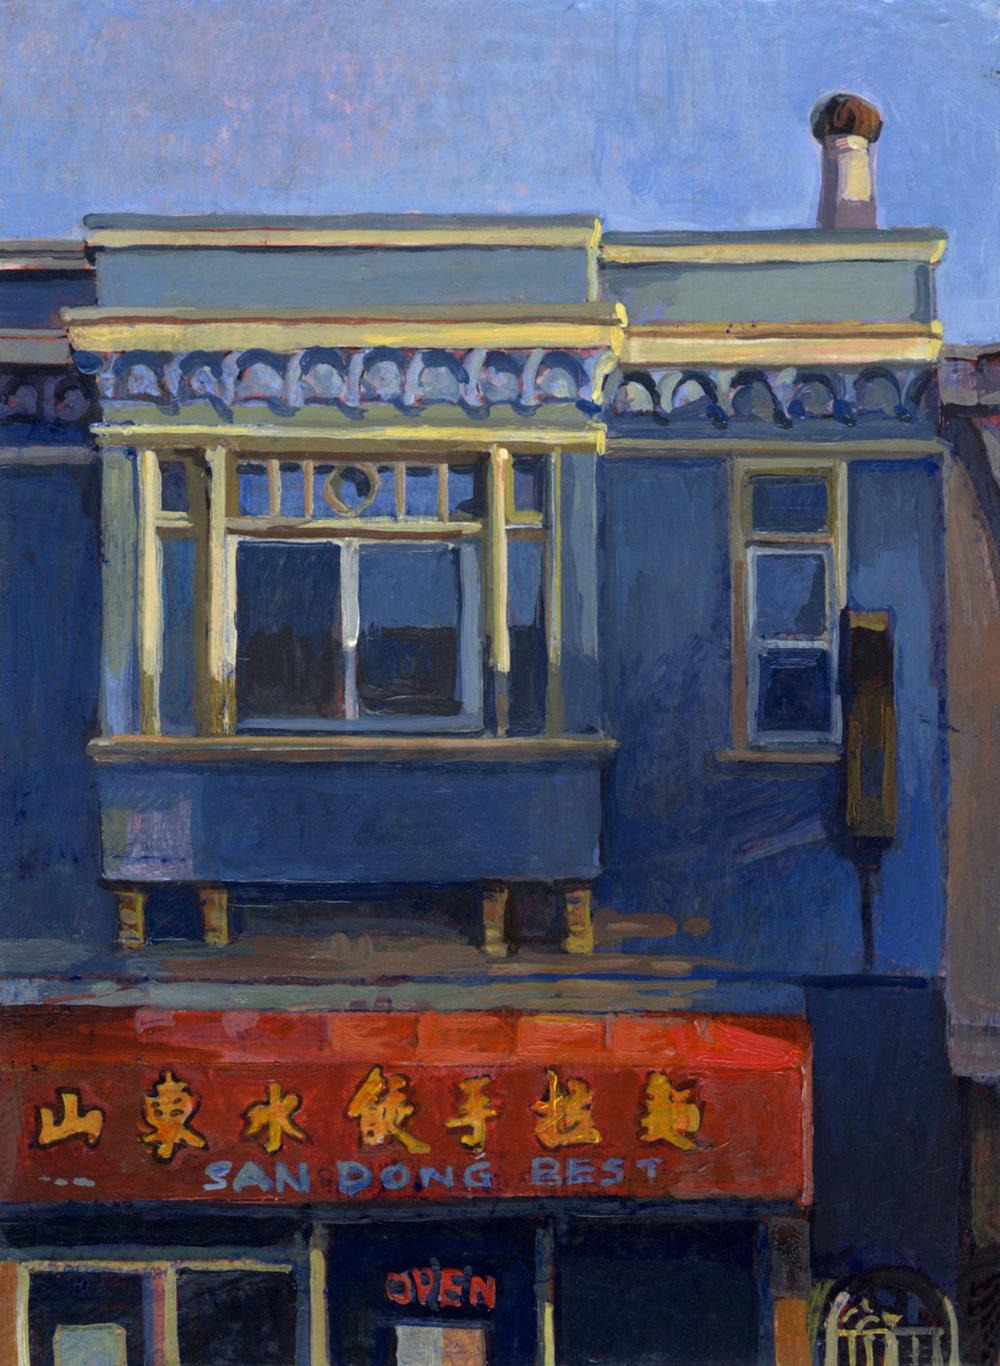 San Dong Best Noodle House